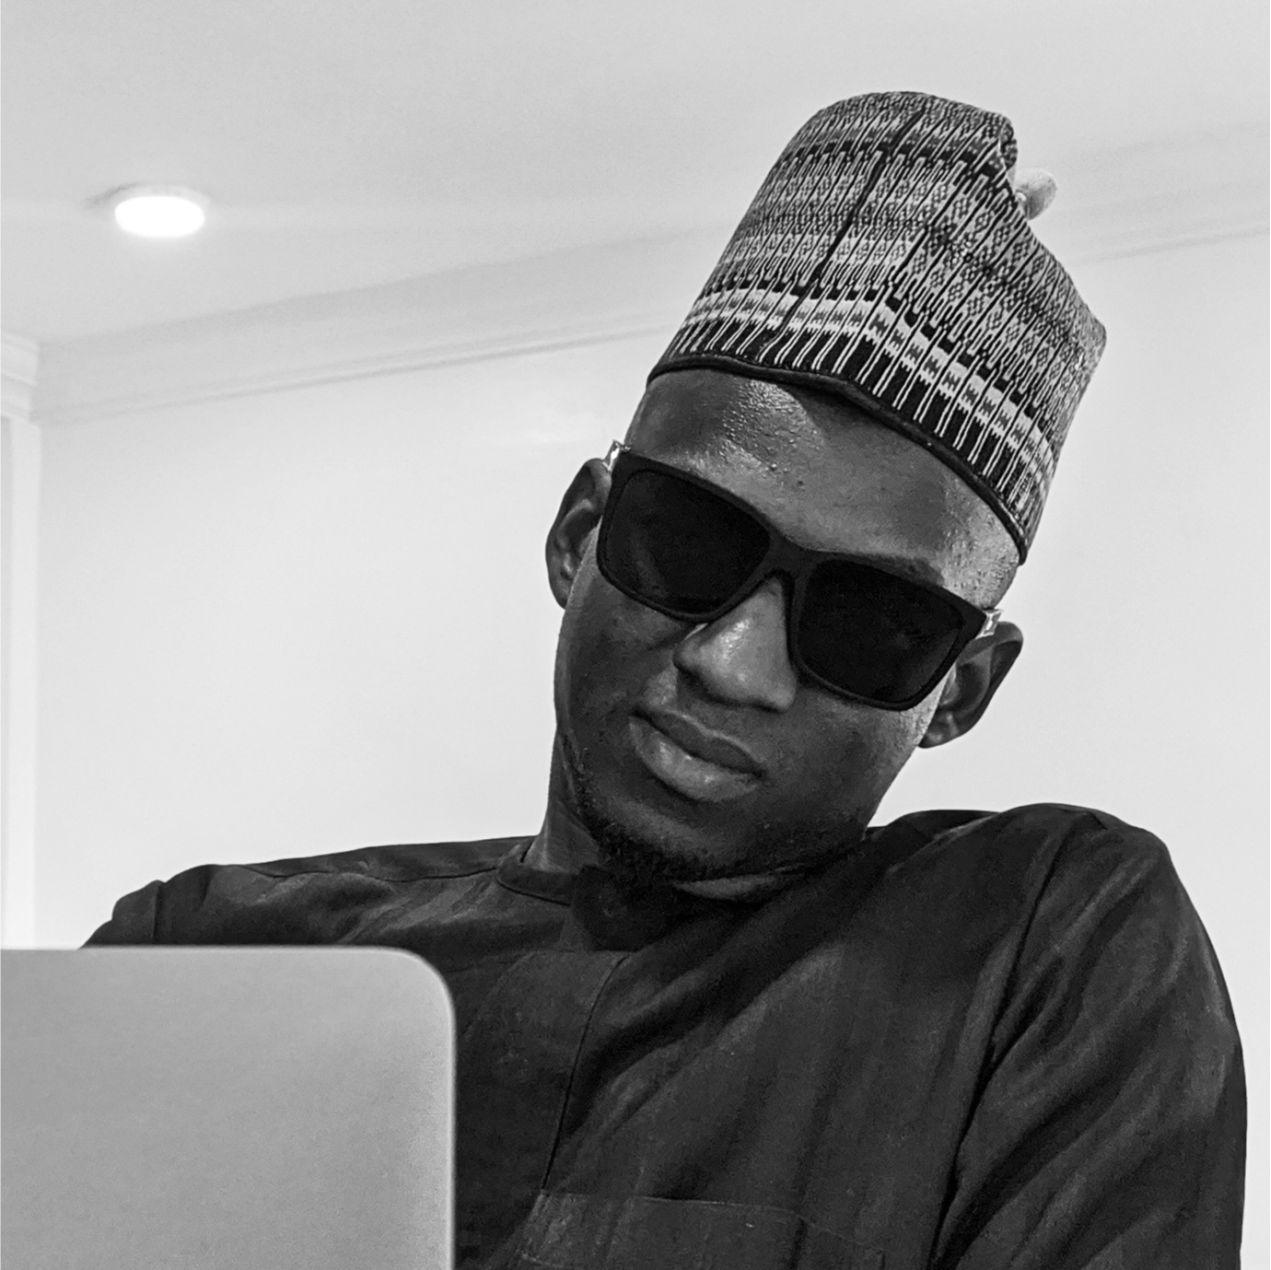 Yusuf Afegbua